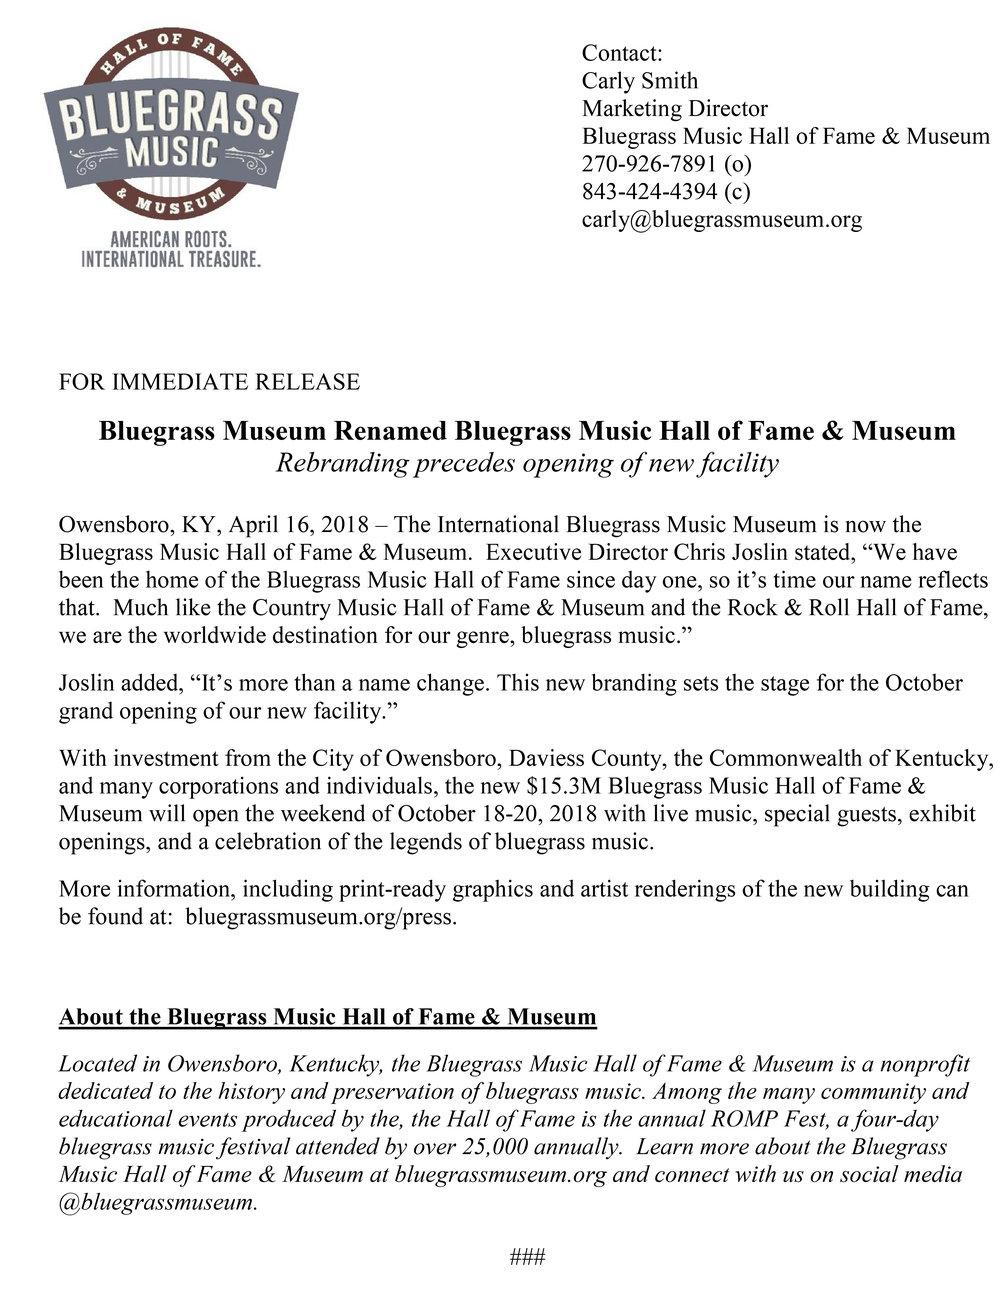 Bluegrass Hall of Fame Rebranding 4-16-18.pdf.jpg